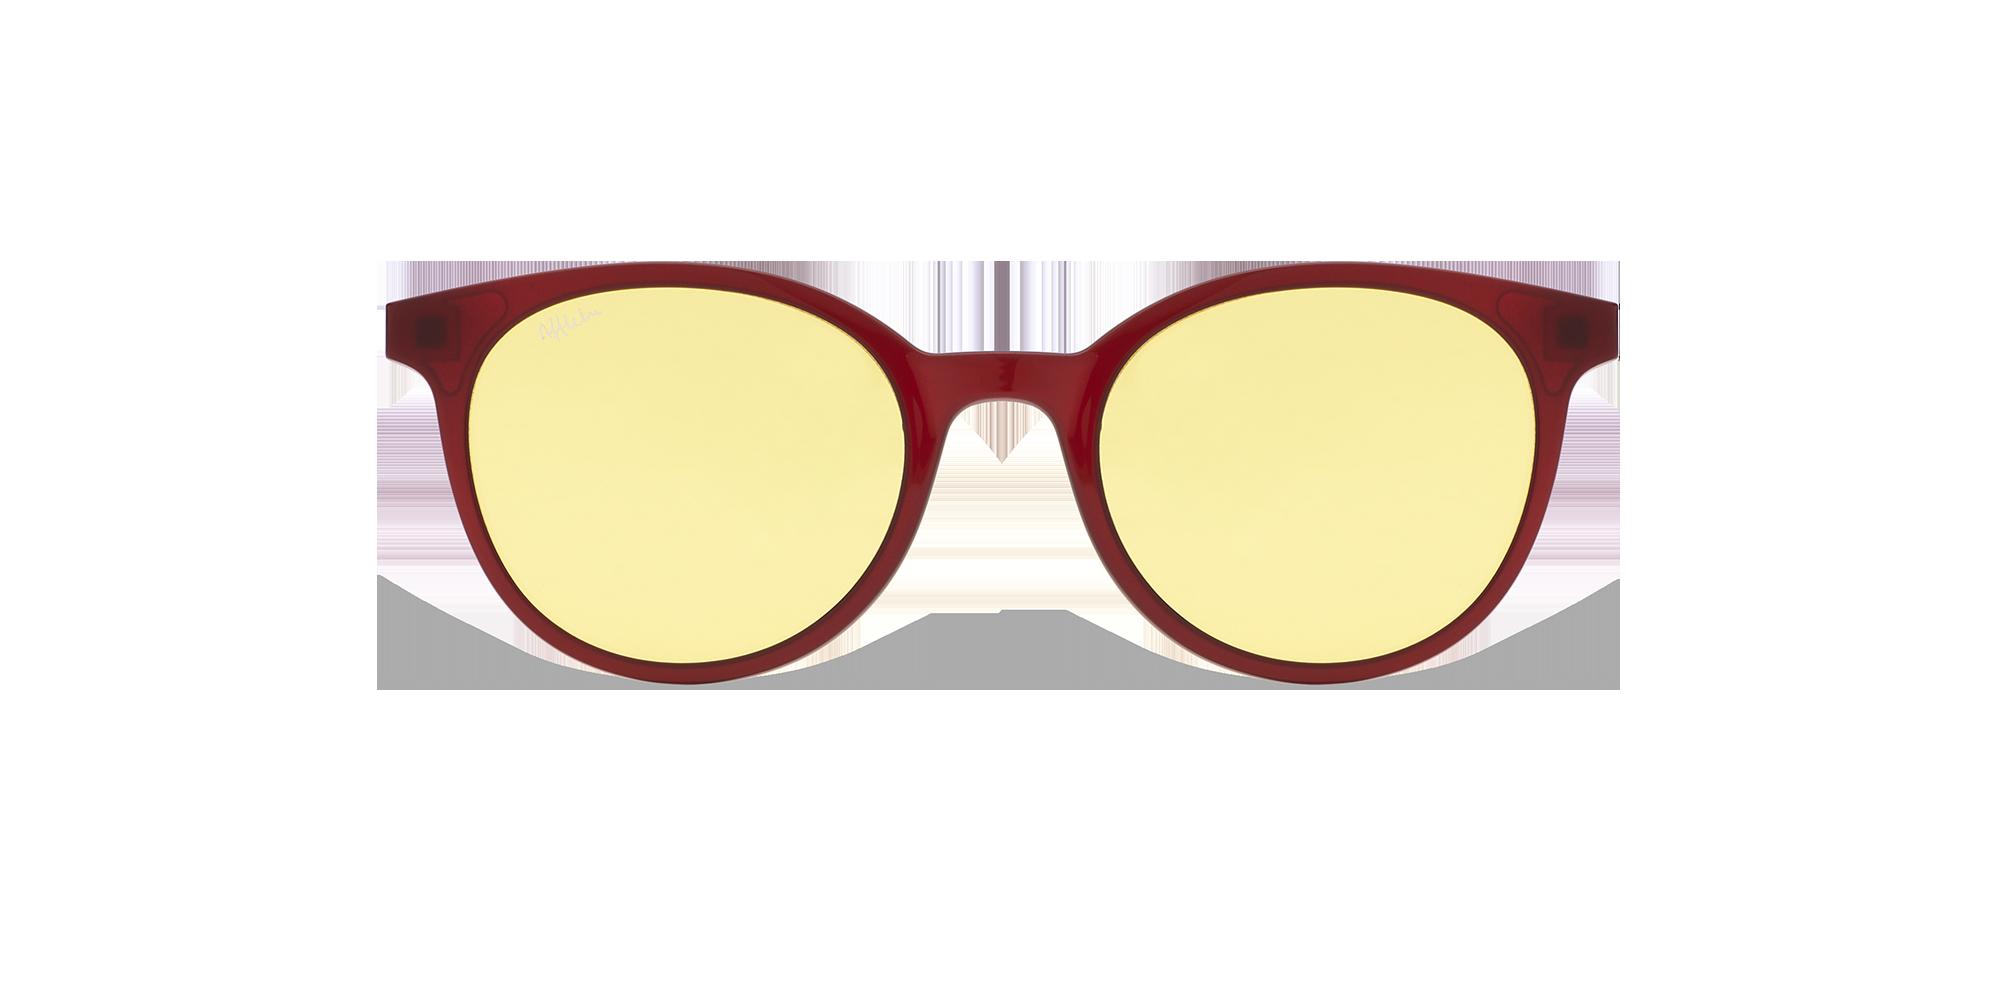 afflelou/france/products/smart_clip/clips_glasses/TMK36YERD014819.png